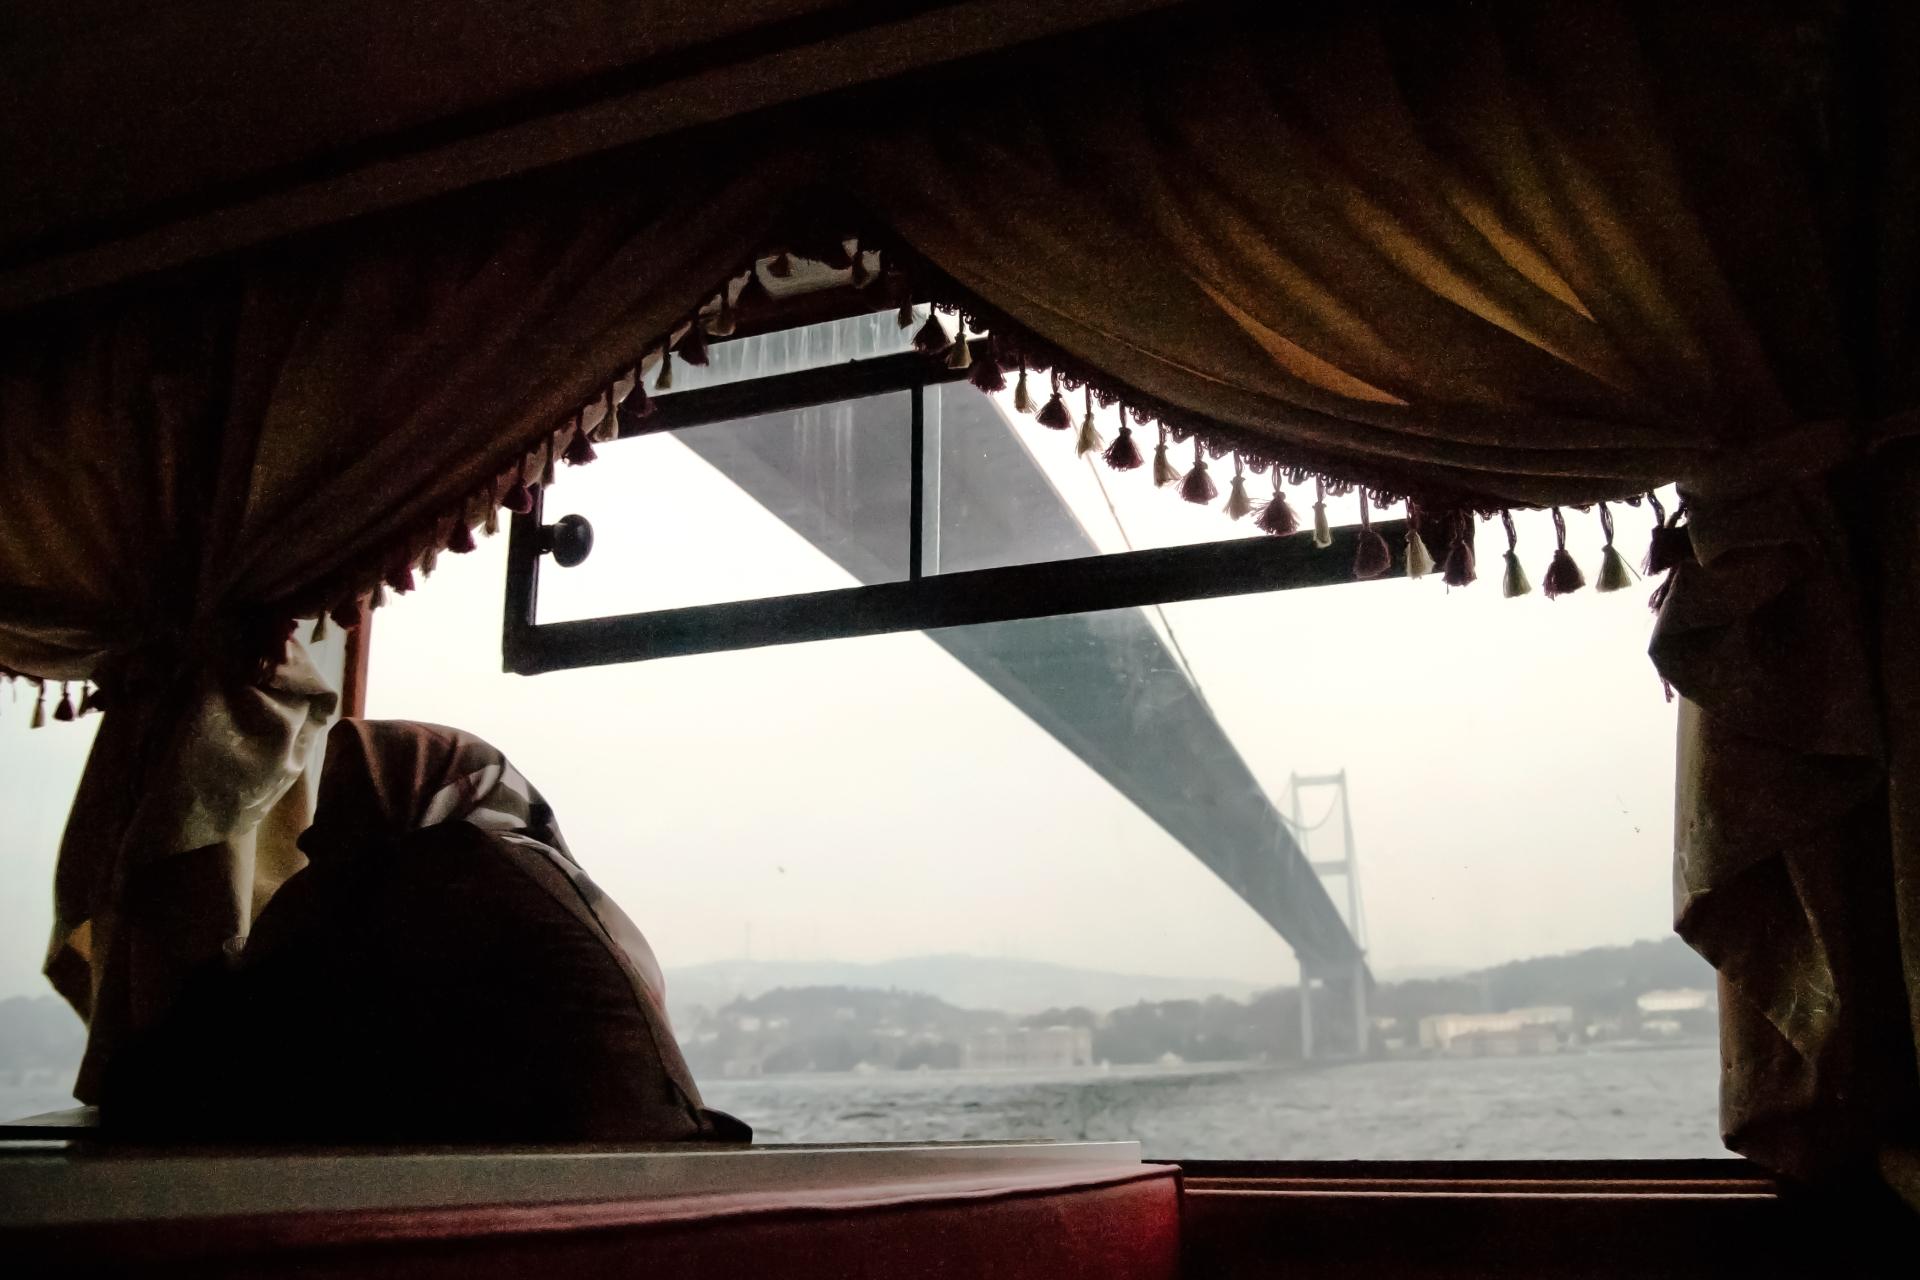 Istanbul_IGP1185b_Carolin-Weinkopf